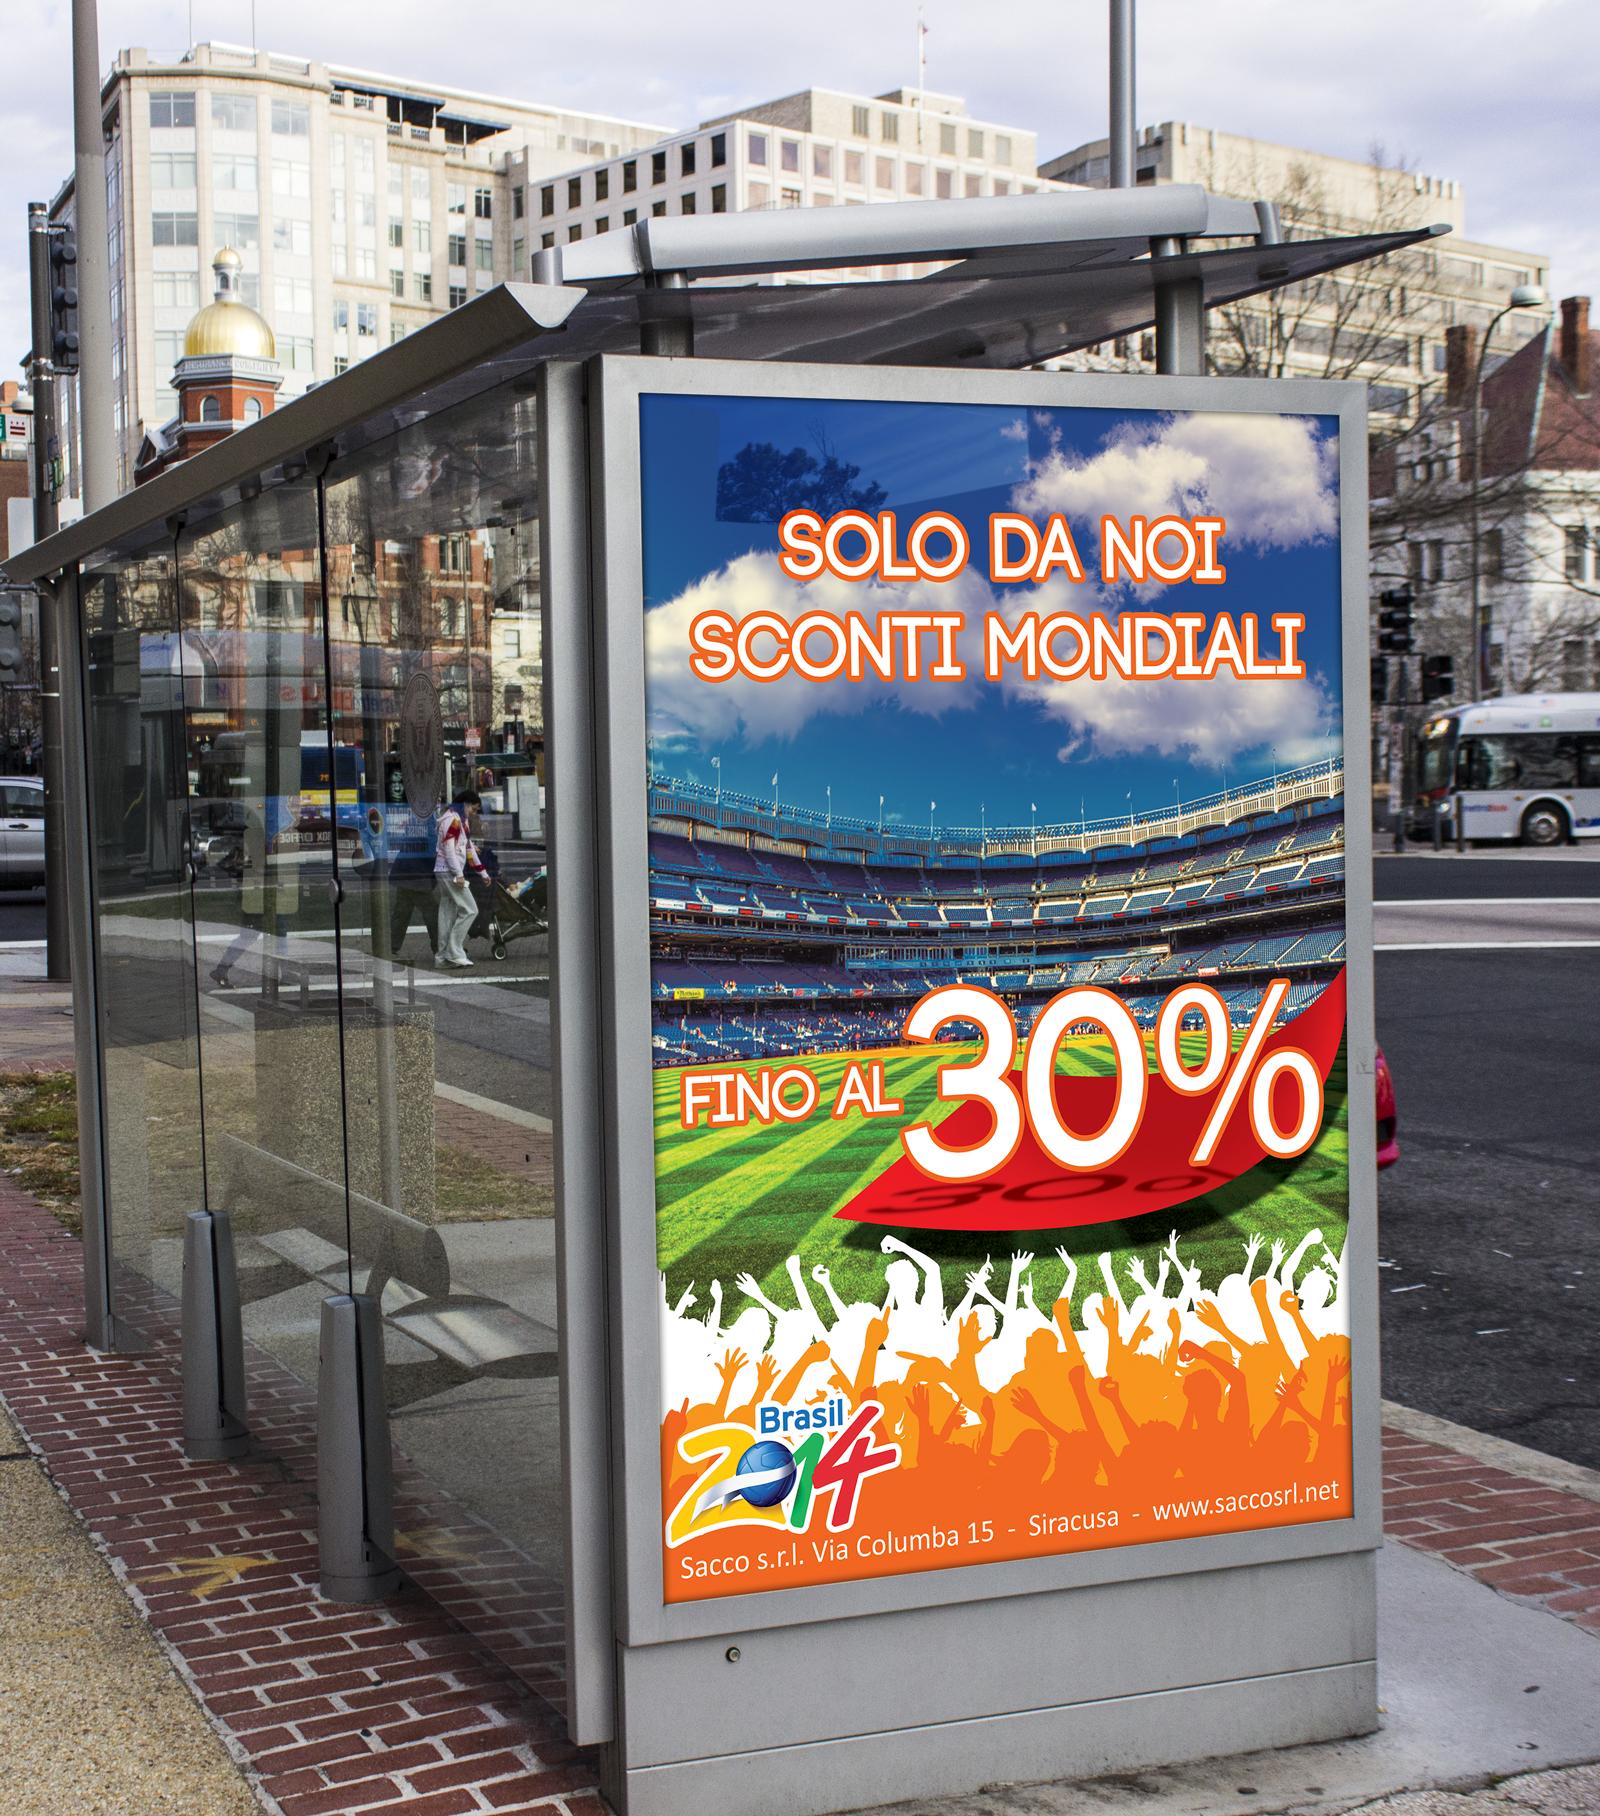 5-sacco-expert-affissioni-mondiali2014